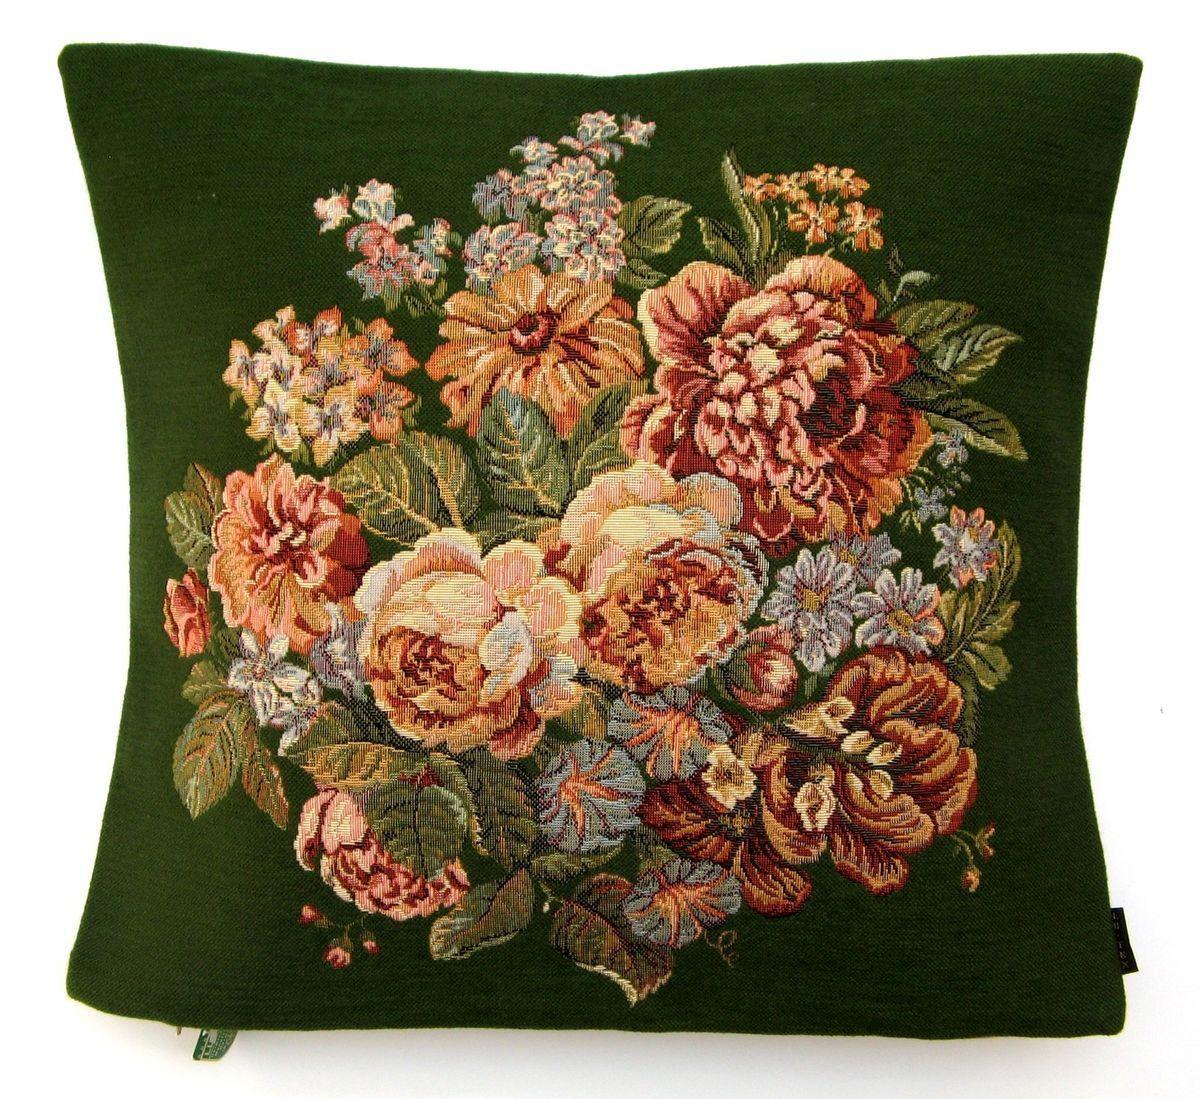 Bouquet Blumen Gruen Gobelin Kissen Kissenbezug 46x46 Kissenhuelle